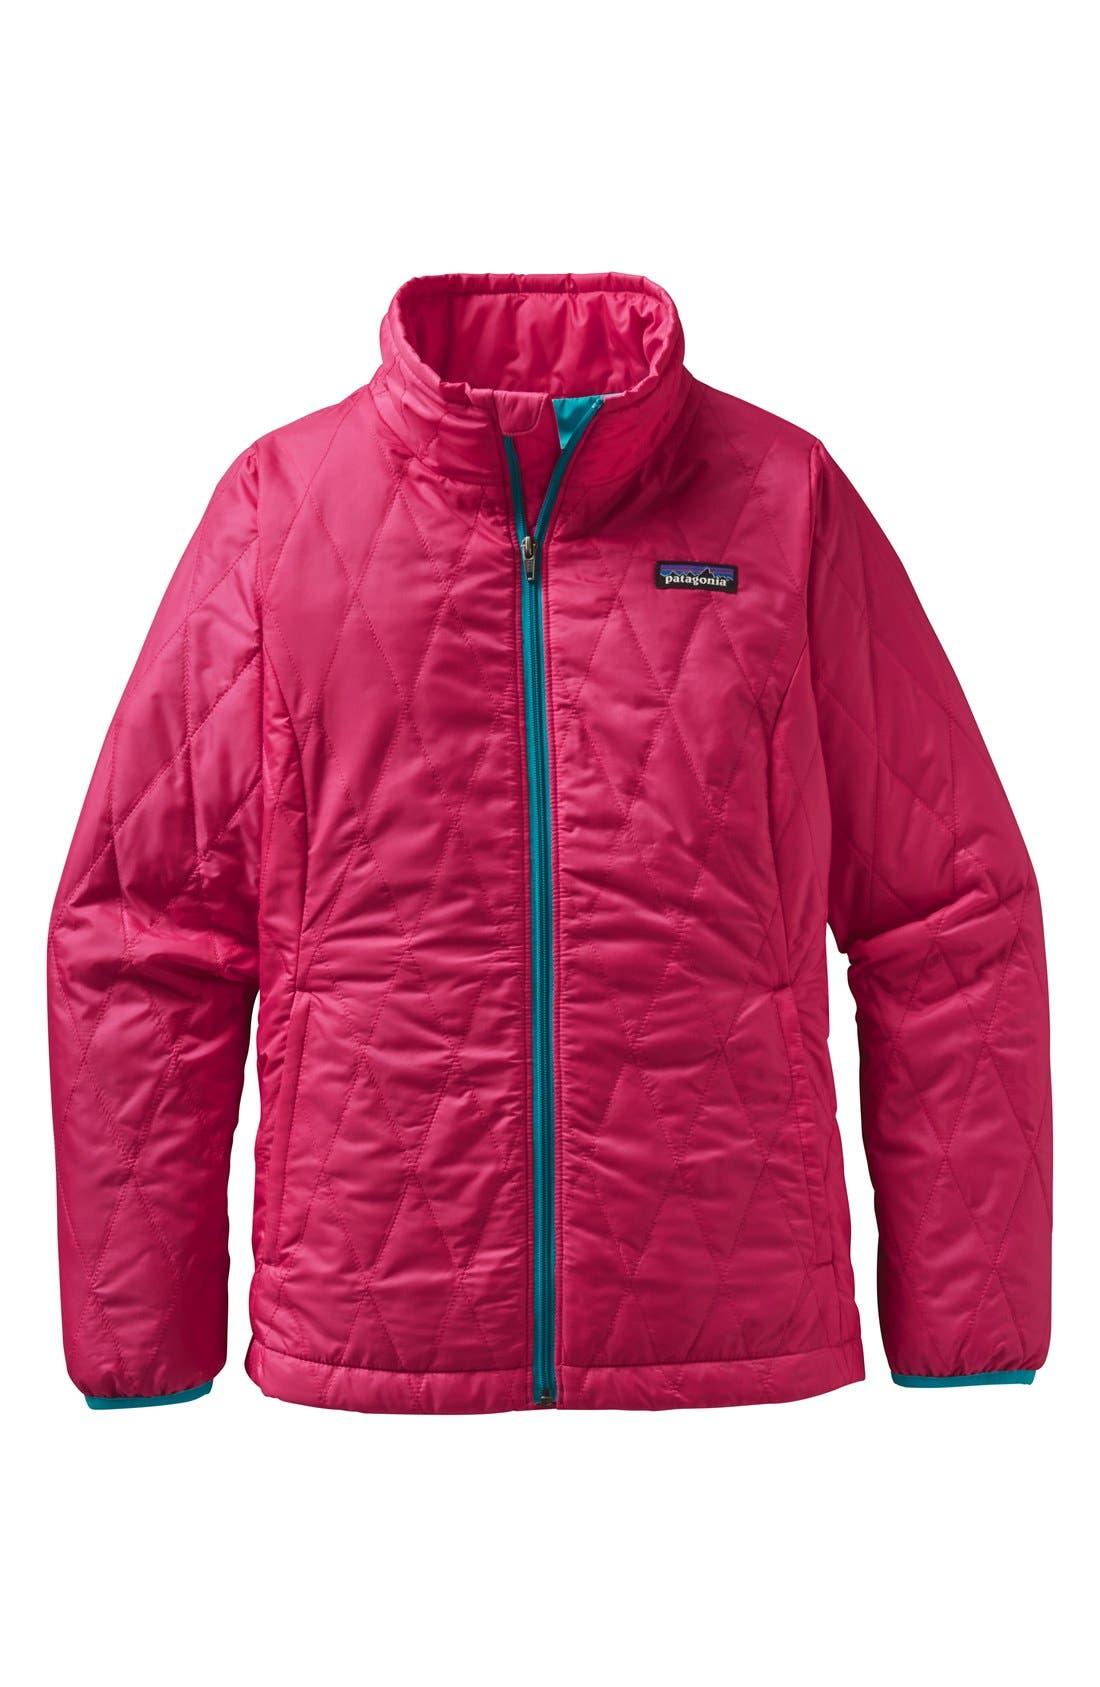 Main Image - Patagonia 'Nano Puff' Wind Resistant & Water Repellent Jacket (Little Girls & Big Girls)